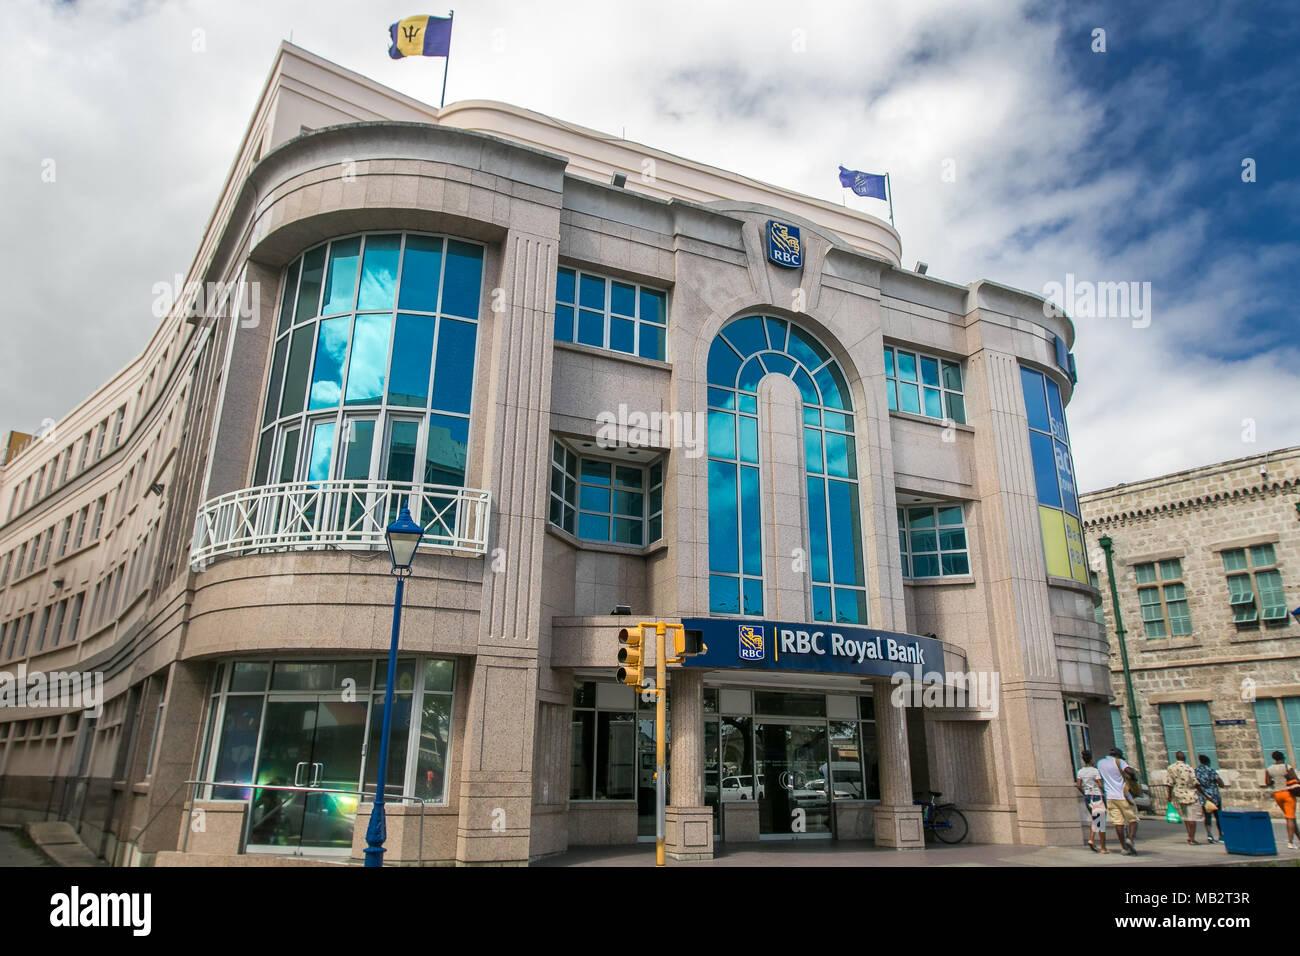 RBC Royal Bank branch in Bridgetown, Barbados Stock Photo